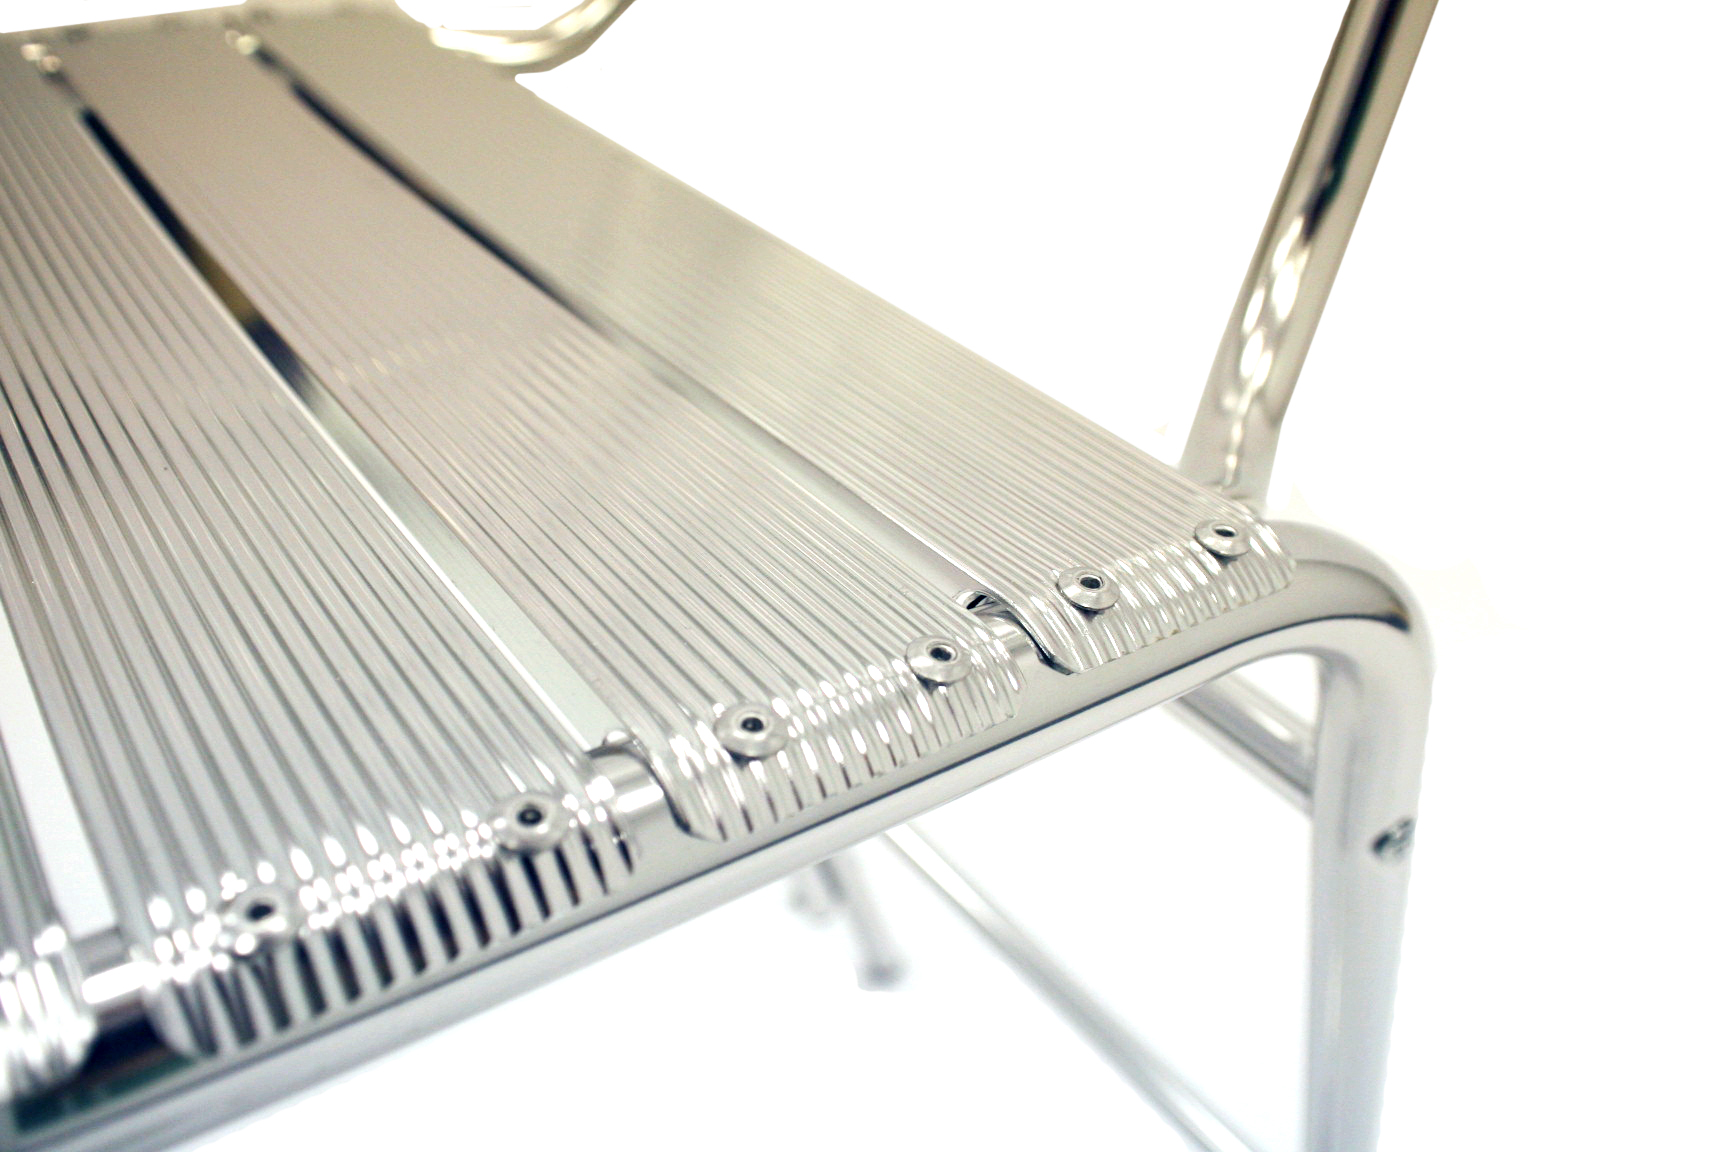 aluminium high stools aluminium bar stool for hire be. Black Bedroom Furniture Sets. Home Design Ideas